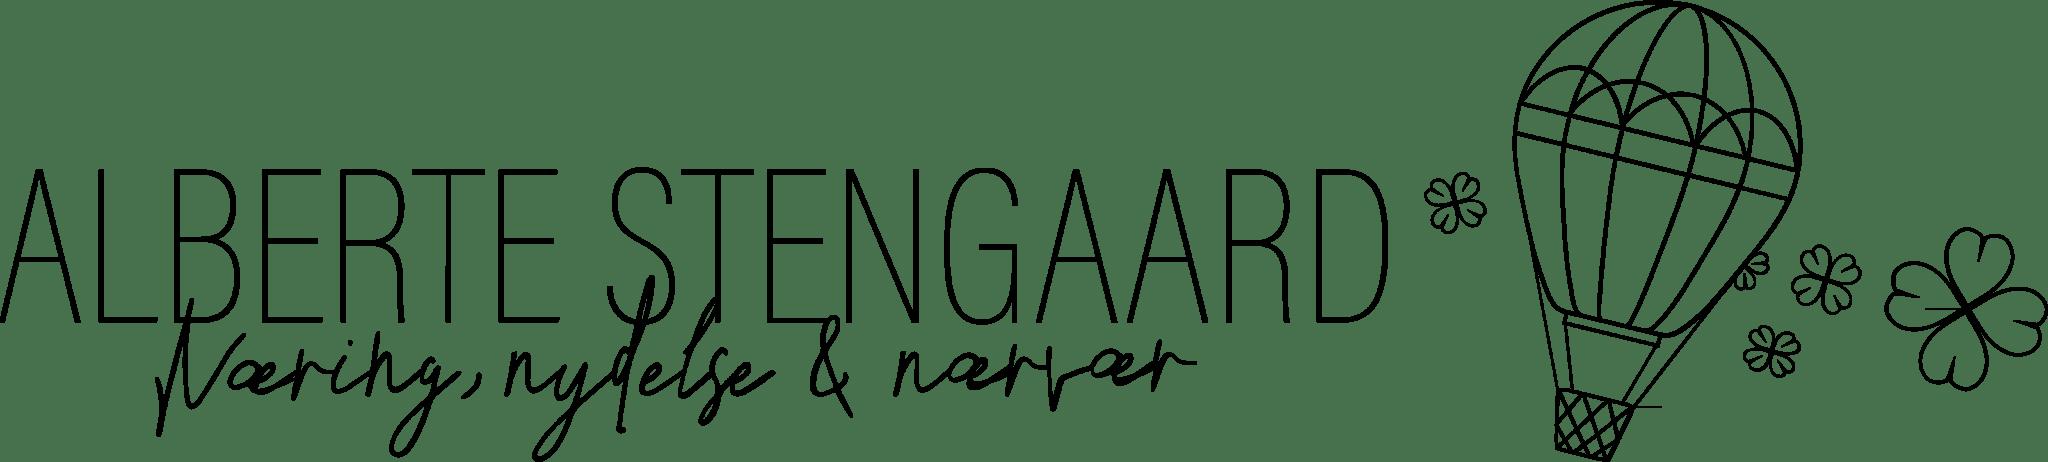 Alberte Stengaard vegansk madblog logo